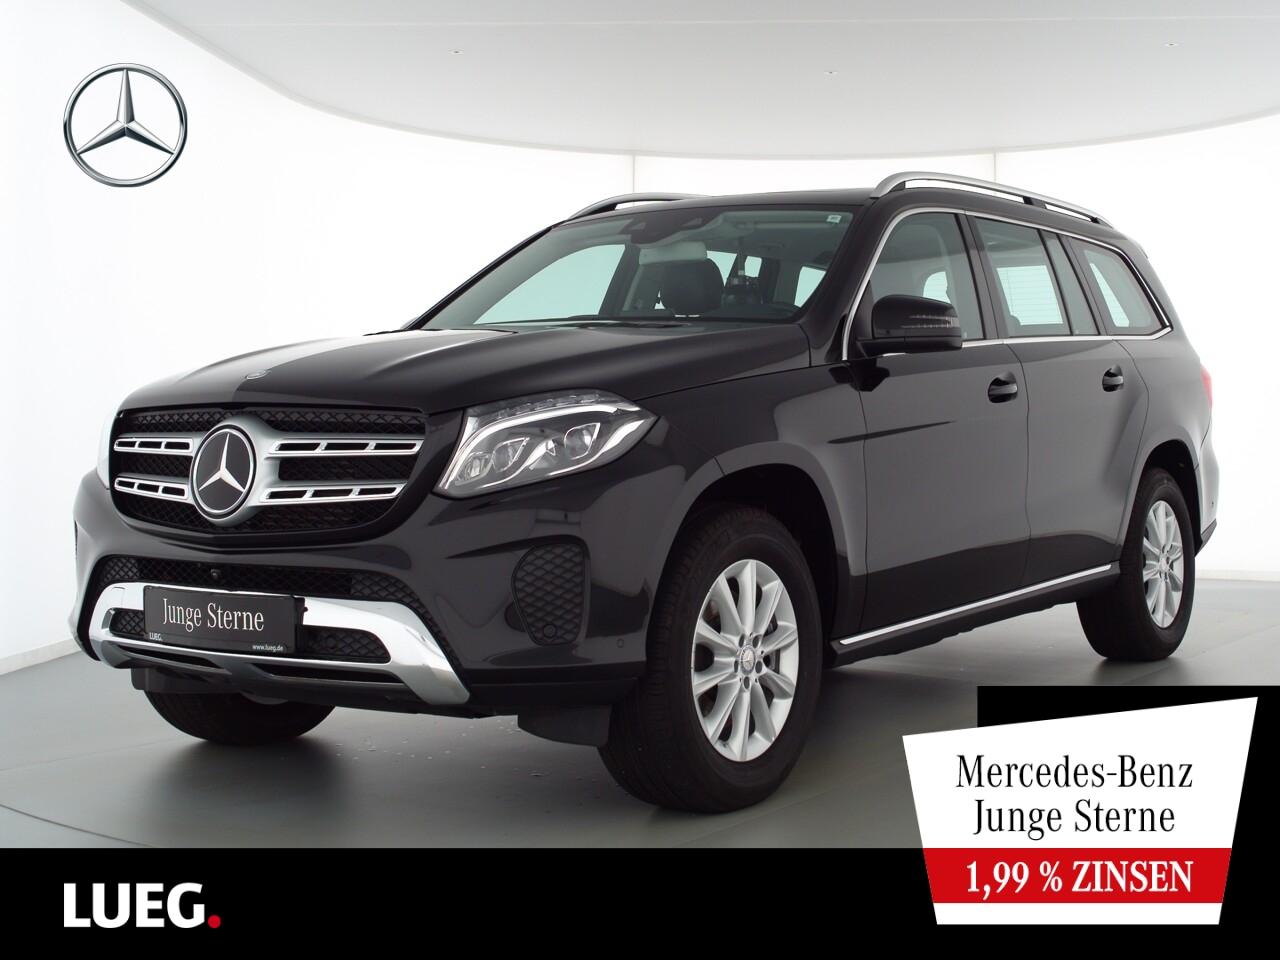 Mercedes-Benz GLS 350 d 4M COM+SHD+LED-ILS+AHK+Sthzg+Airm+360°, Jahr 2017, Diesel